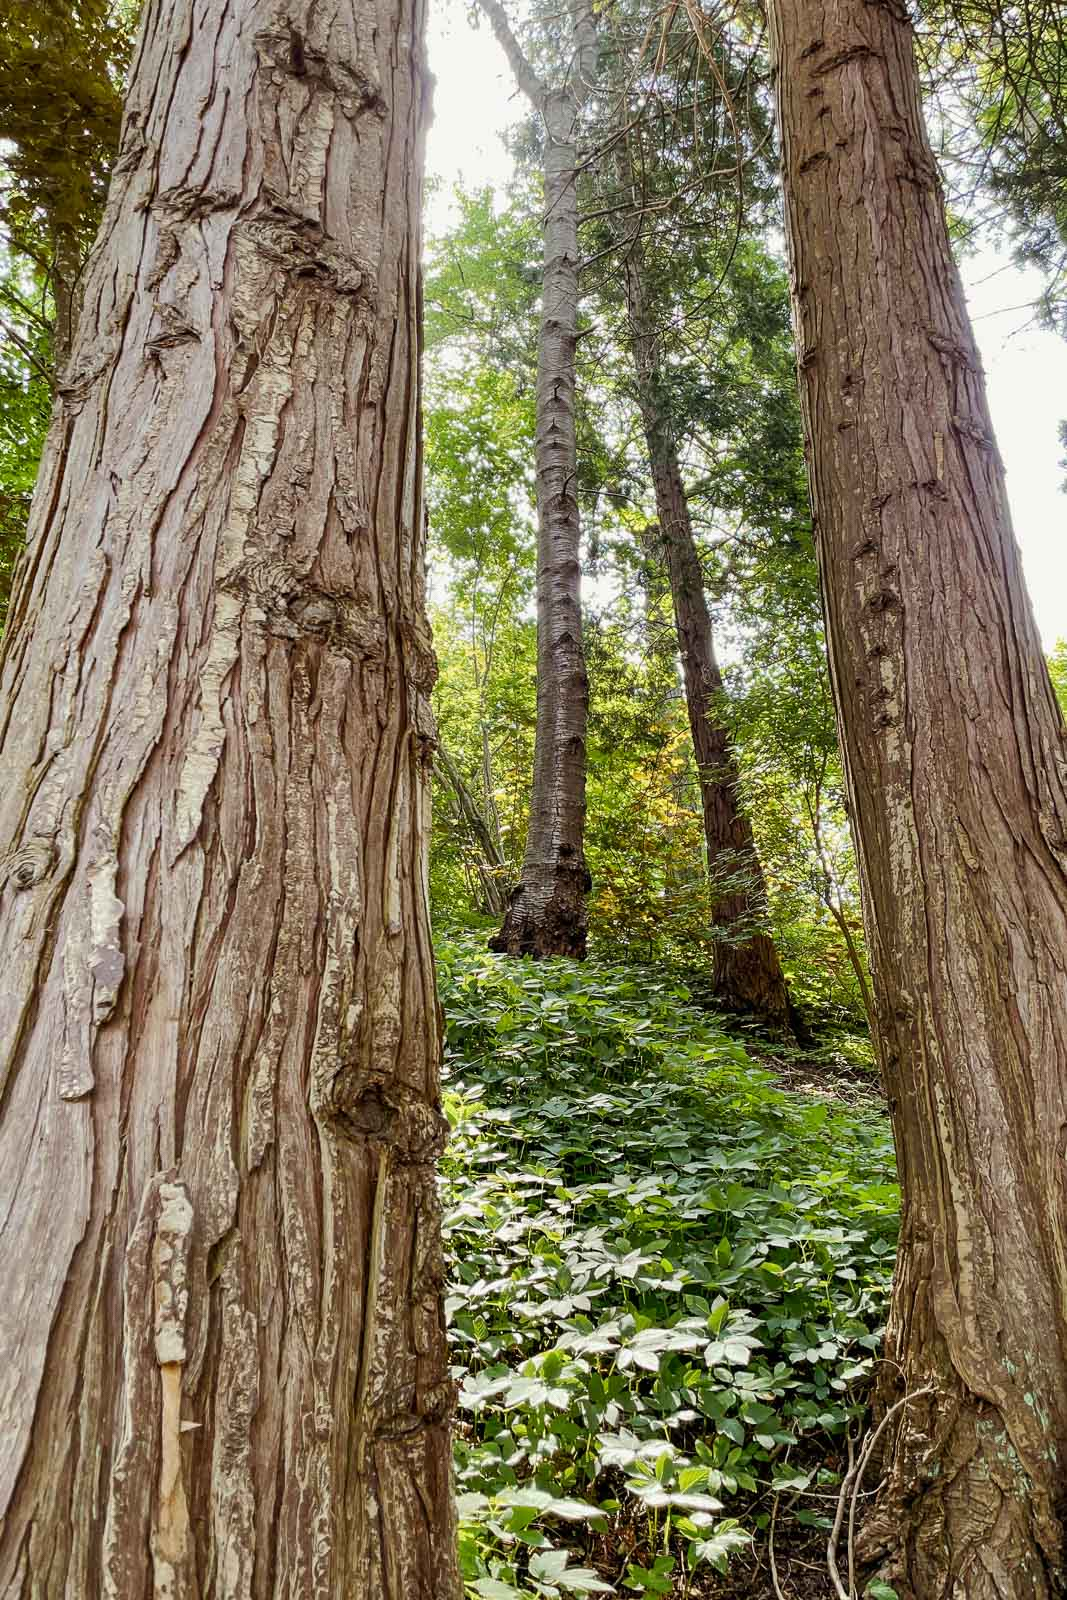 Cypress tree trunks in the Japanese garden